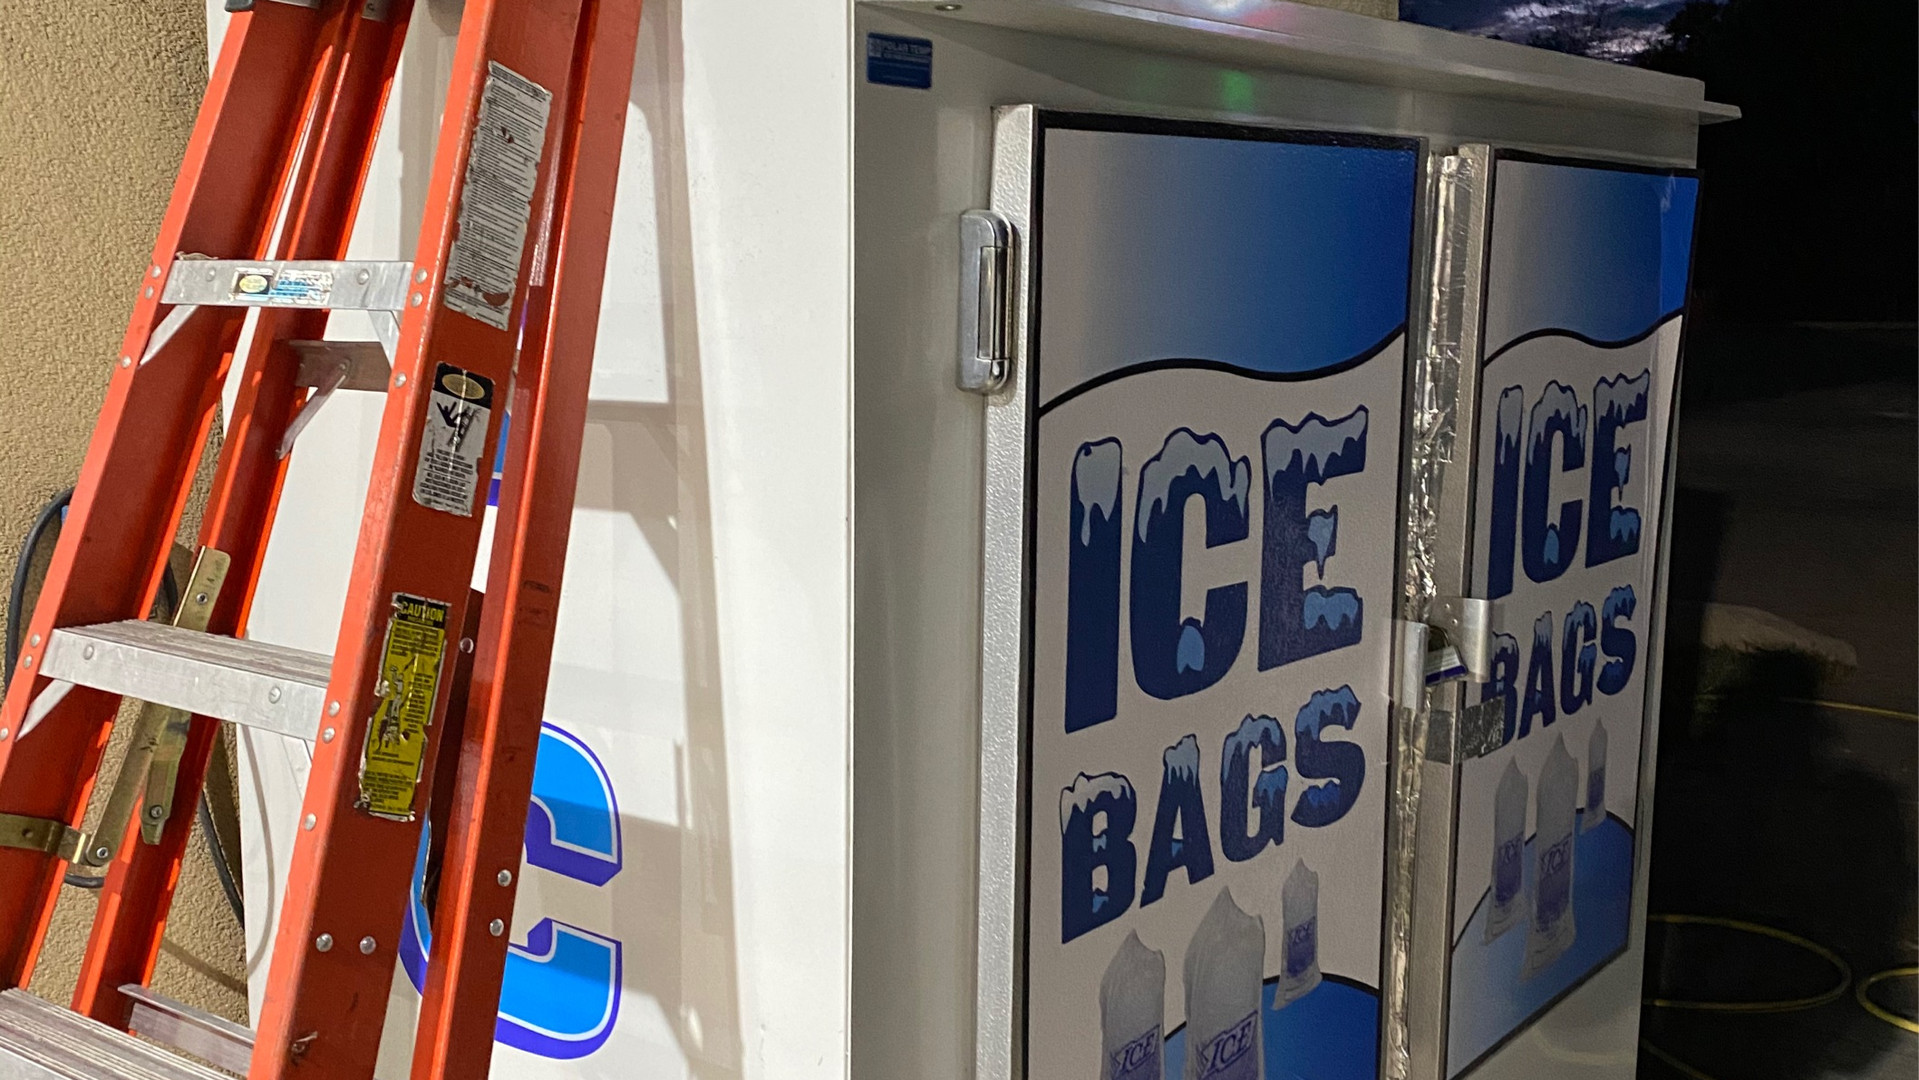 ice merchandiser1.jpg